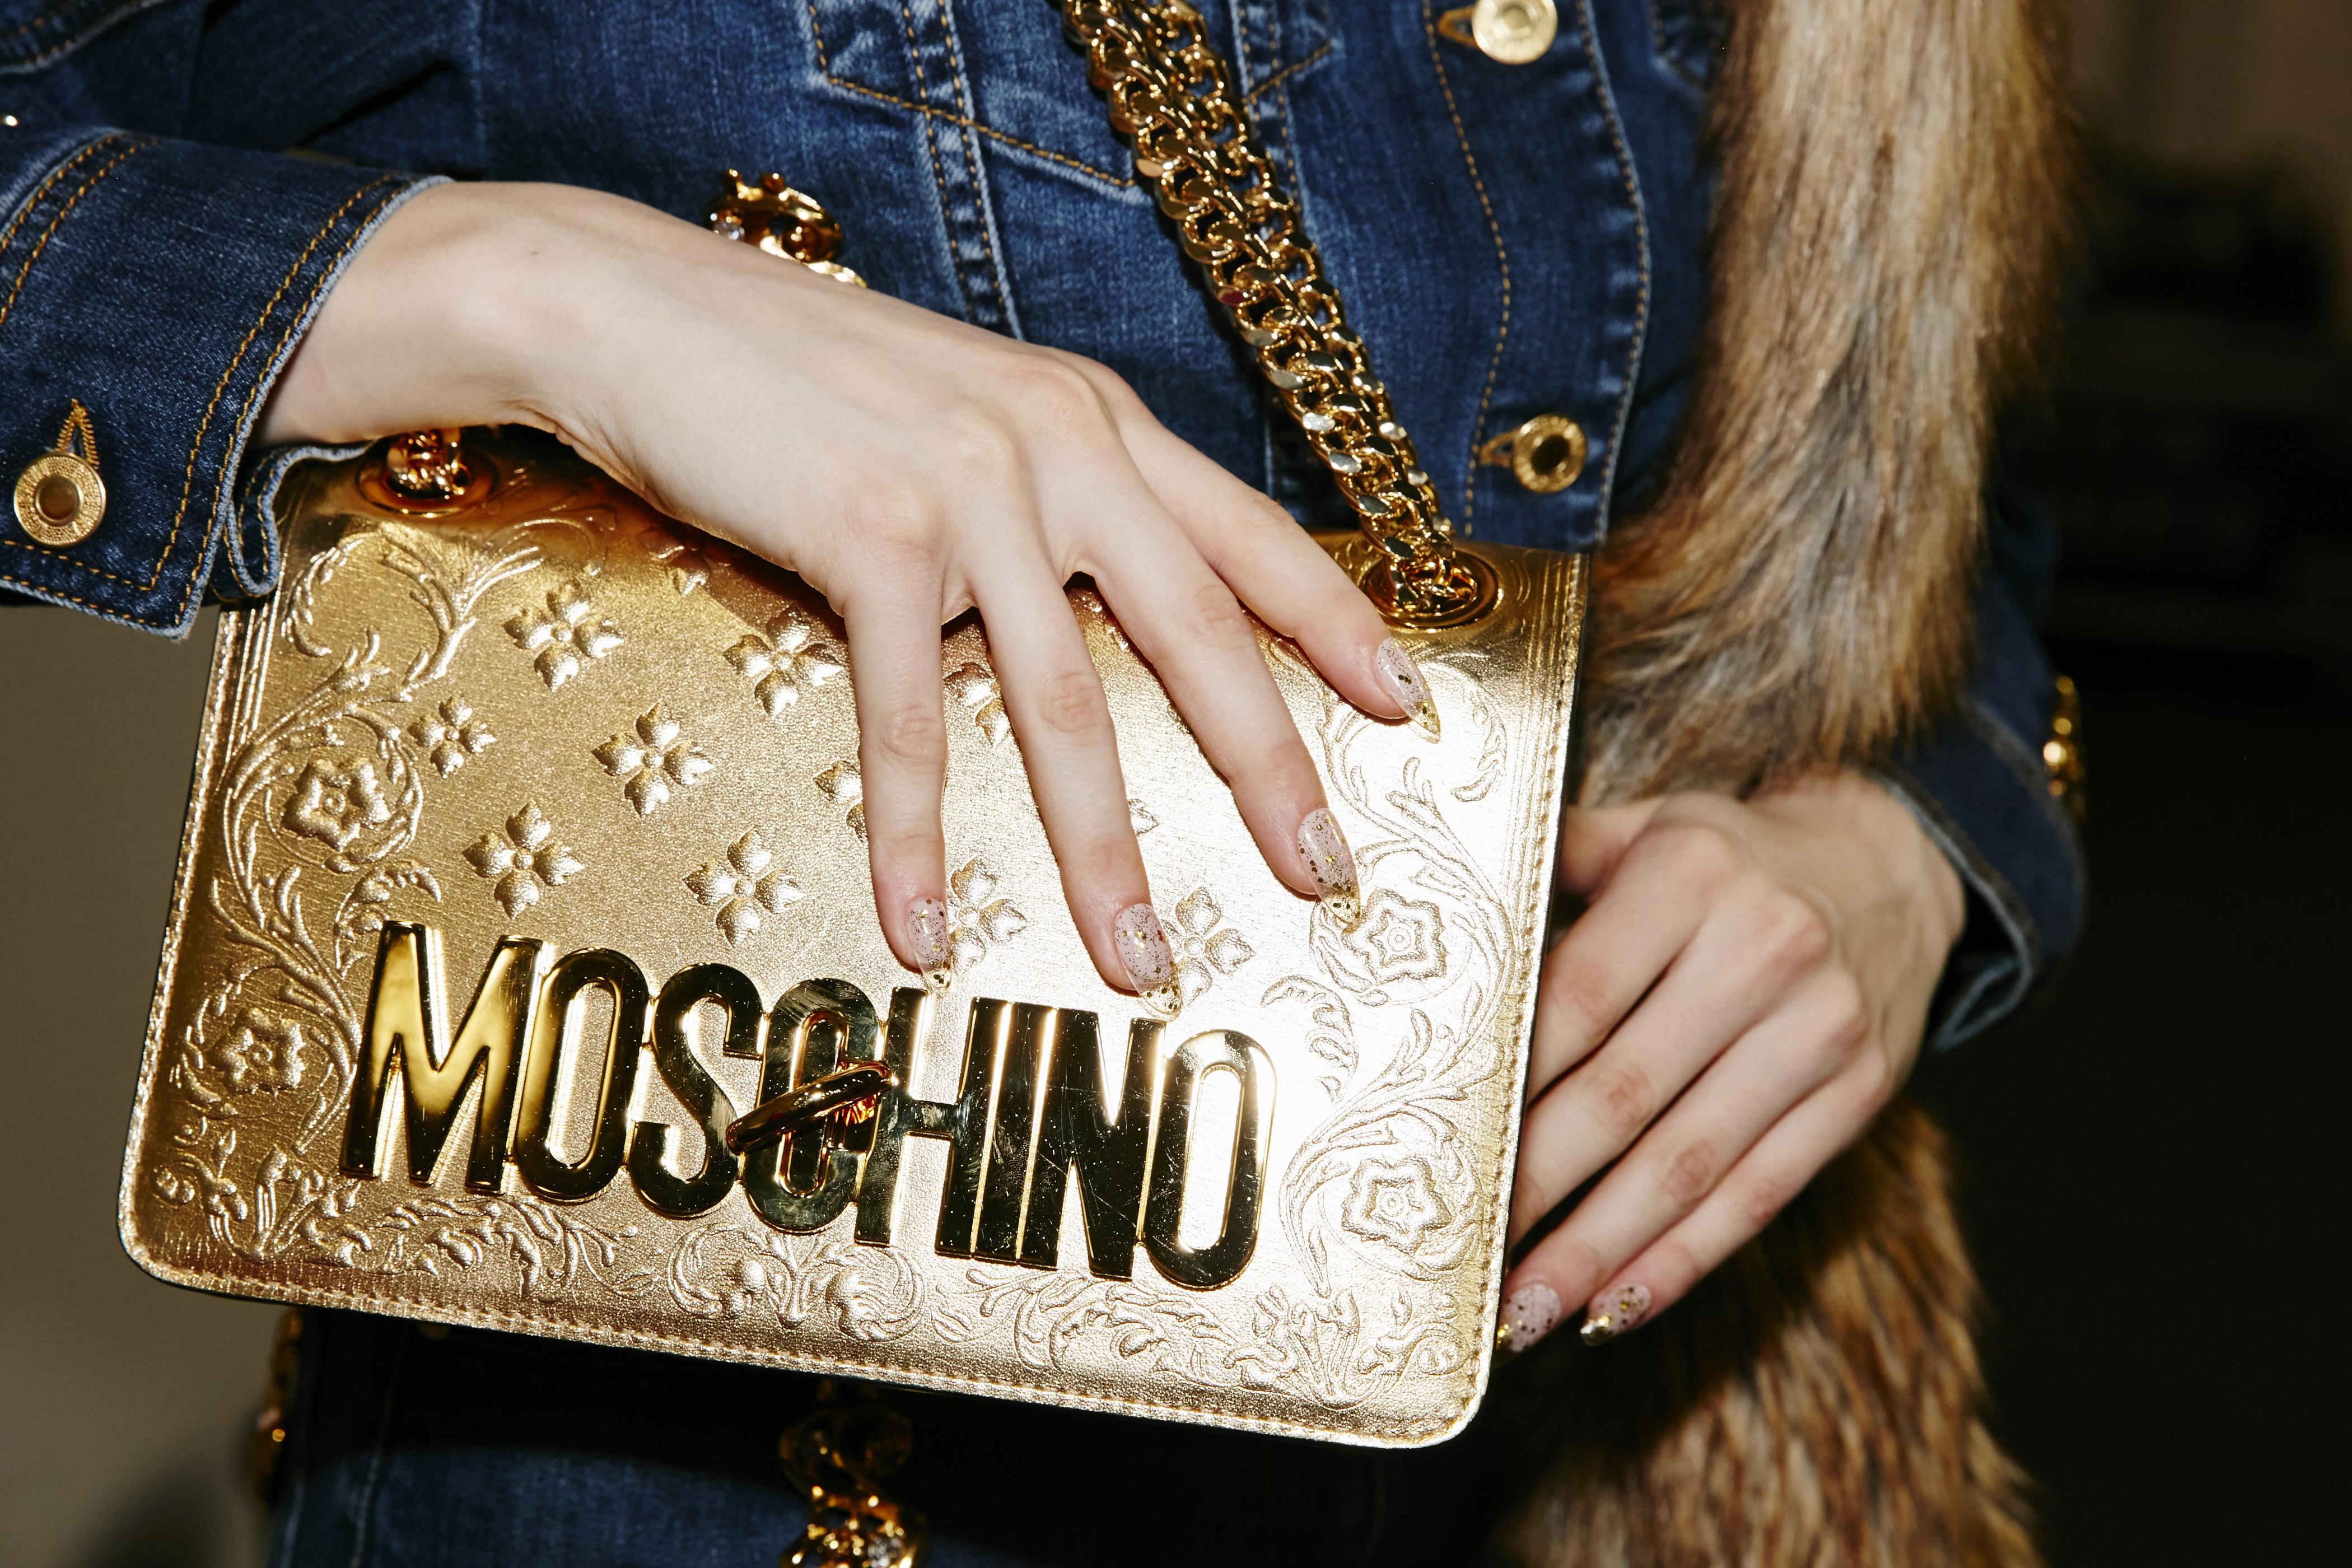 <p>Essie for Moschino, courtesy of Essie</p>